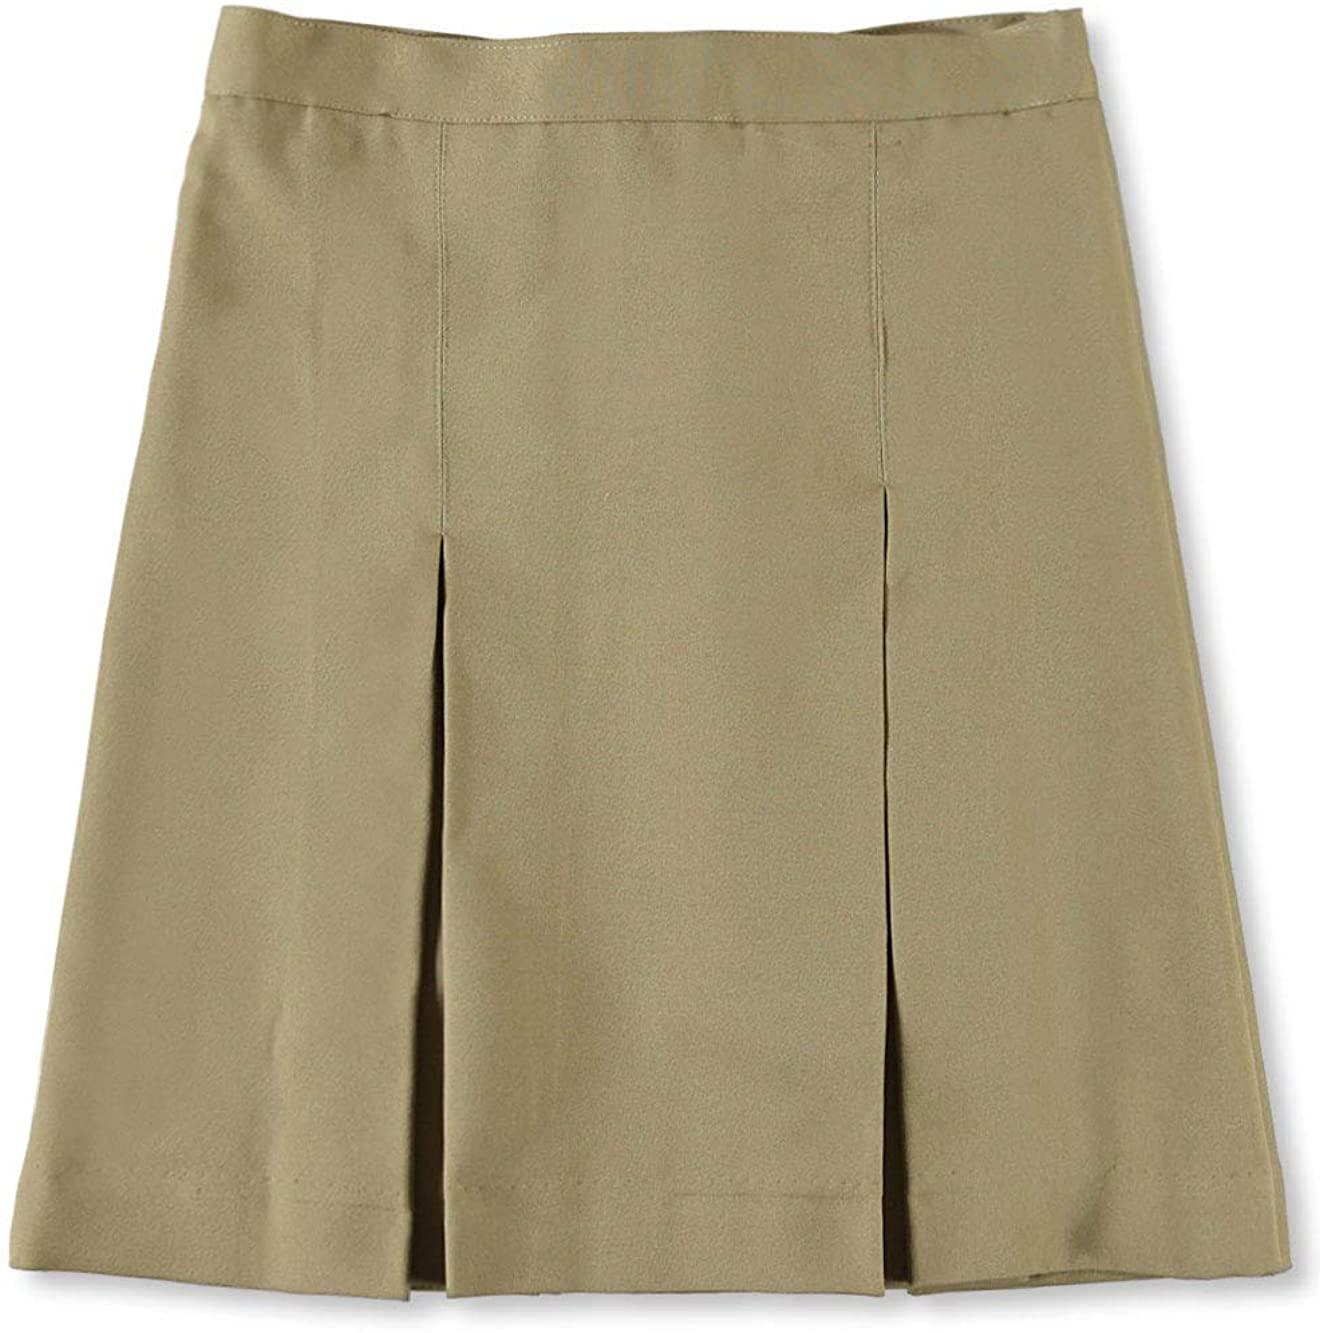 Cookie's Big Girls Pleated Skirt - Khaki, 12